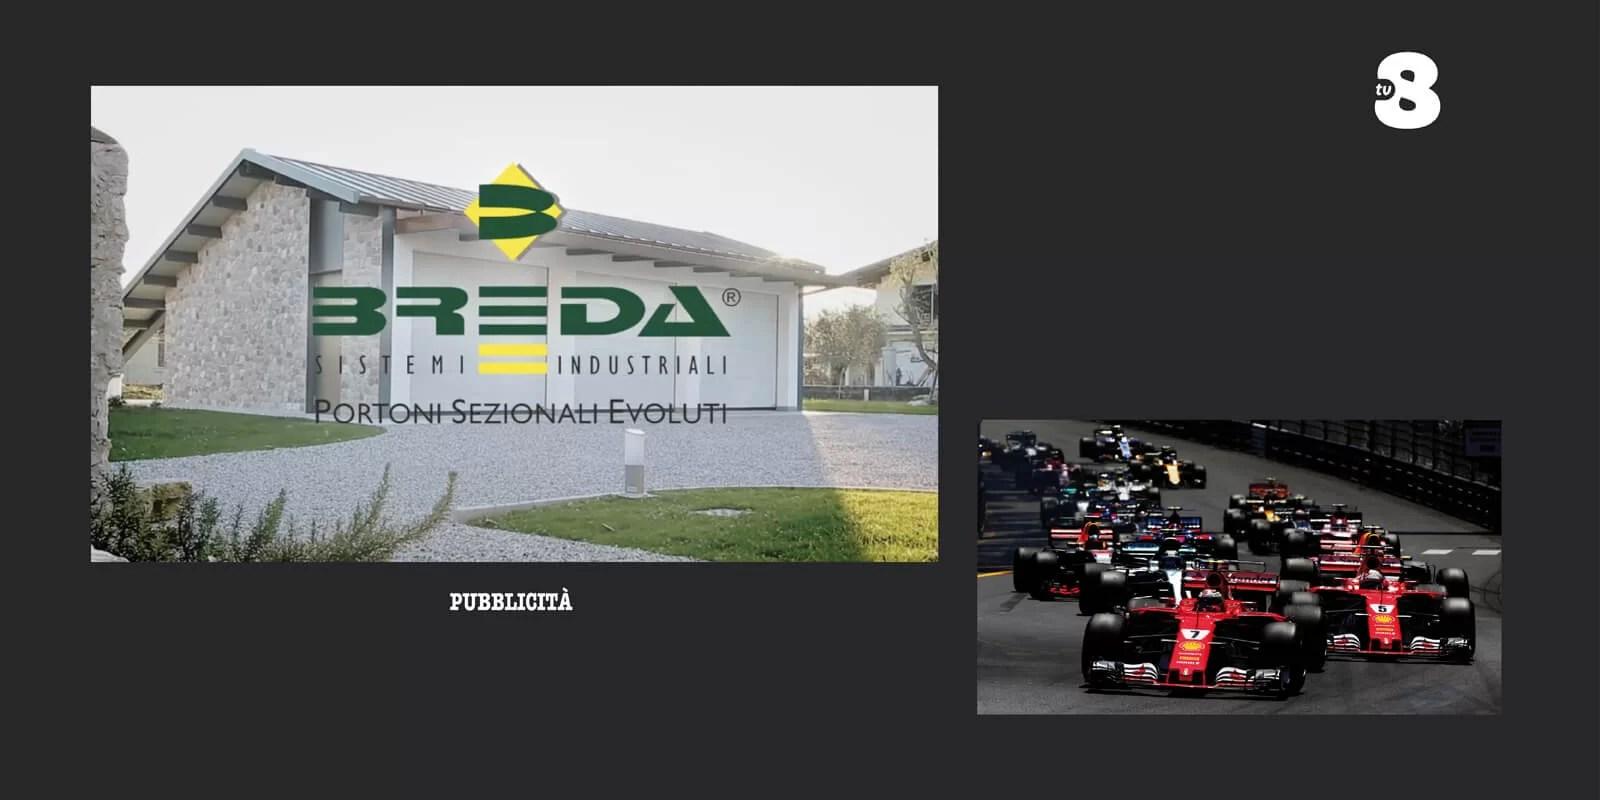 Breda Portoni al GP di Montecarlo su TV8